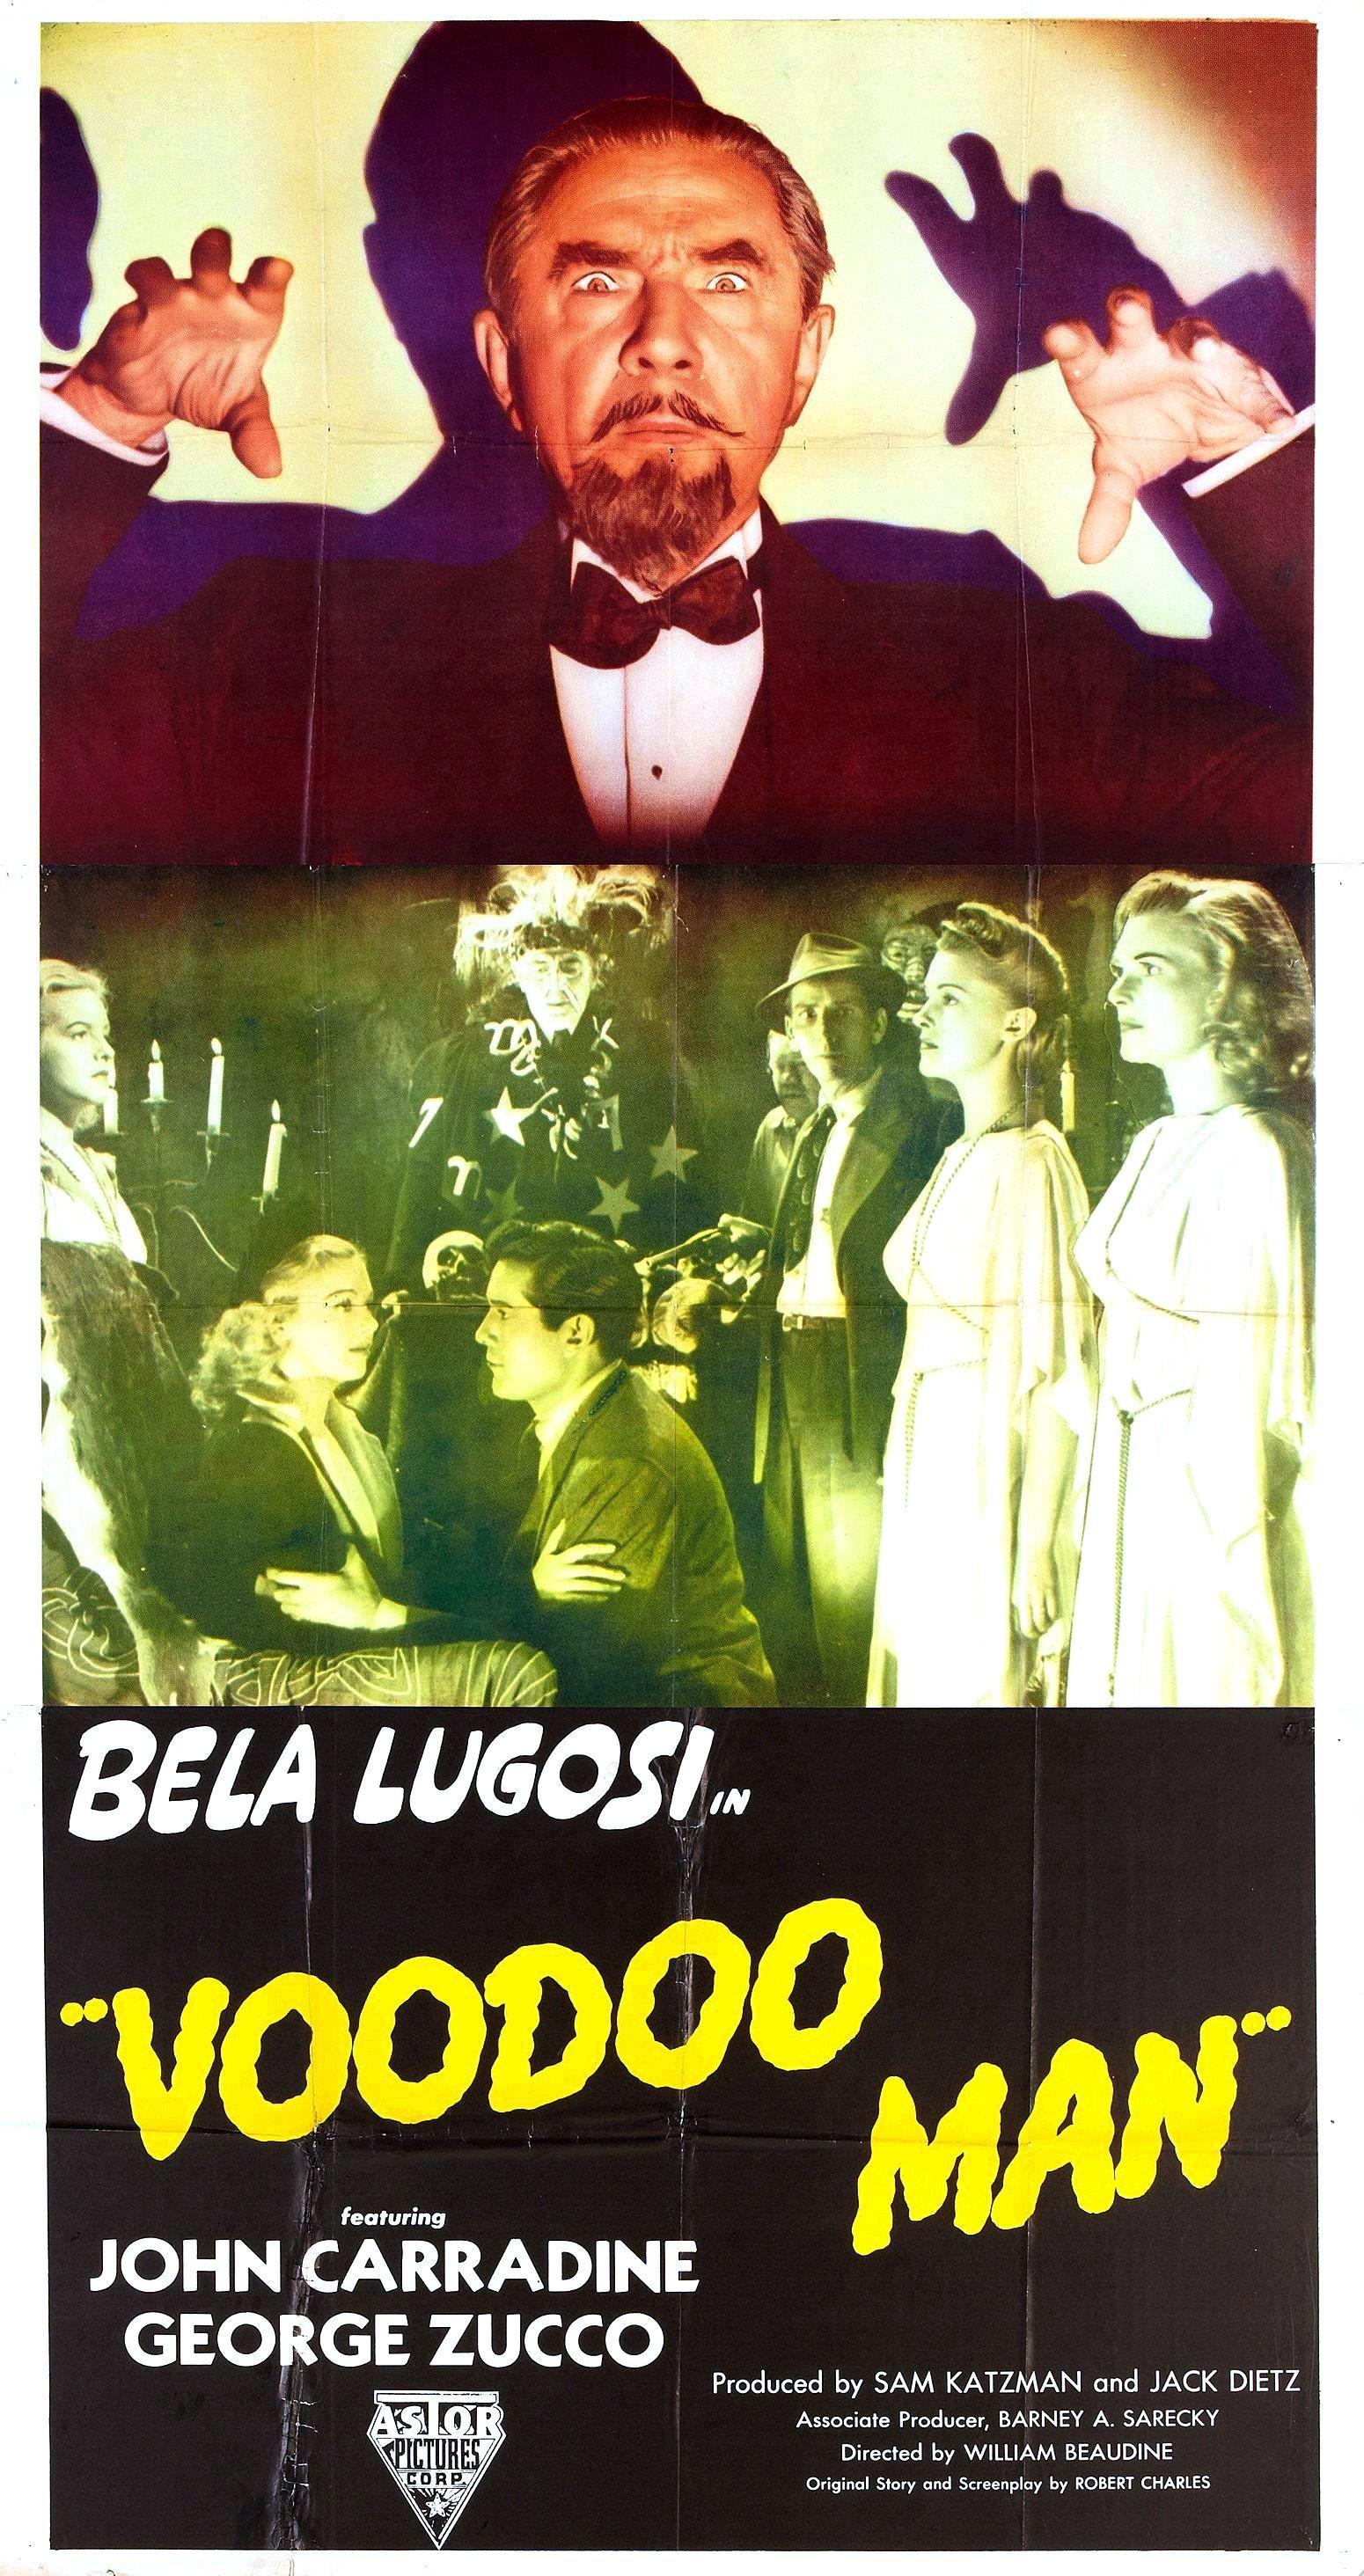 DRACULA MOVIE POSTER Bela Lugosi RARE HOT NEW 7 PRINT IMAGE PHOTO